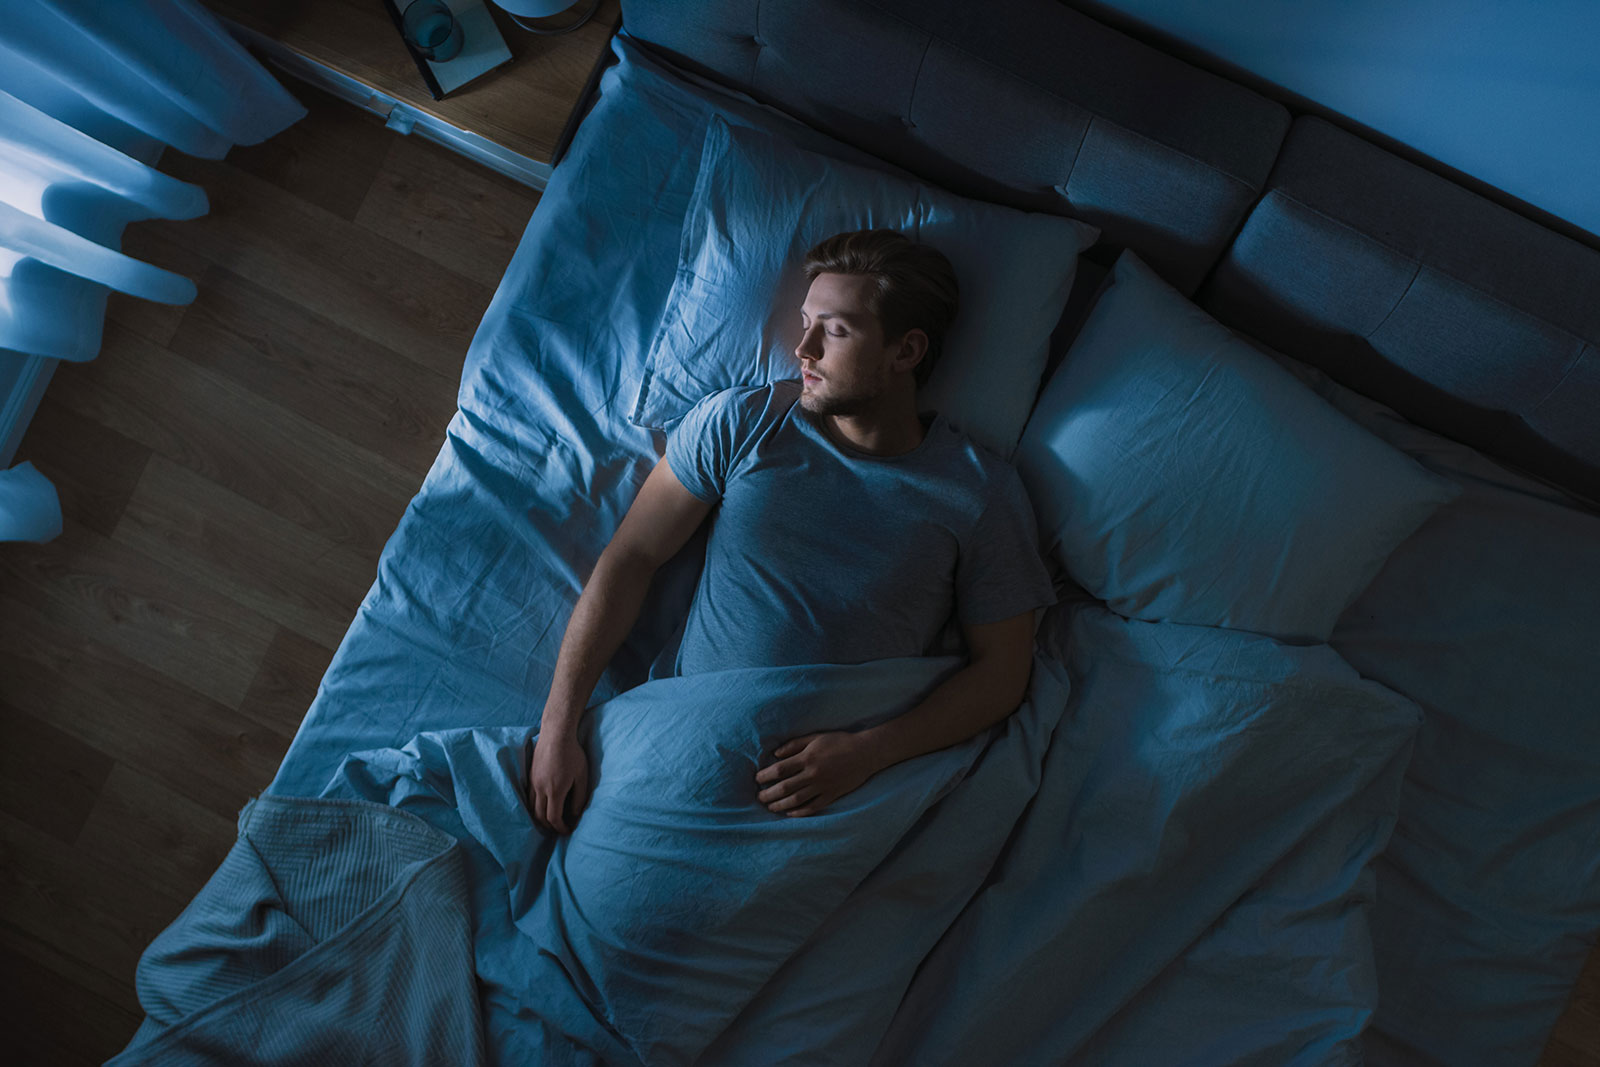 man-sleeping-in-bed